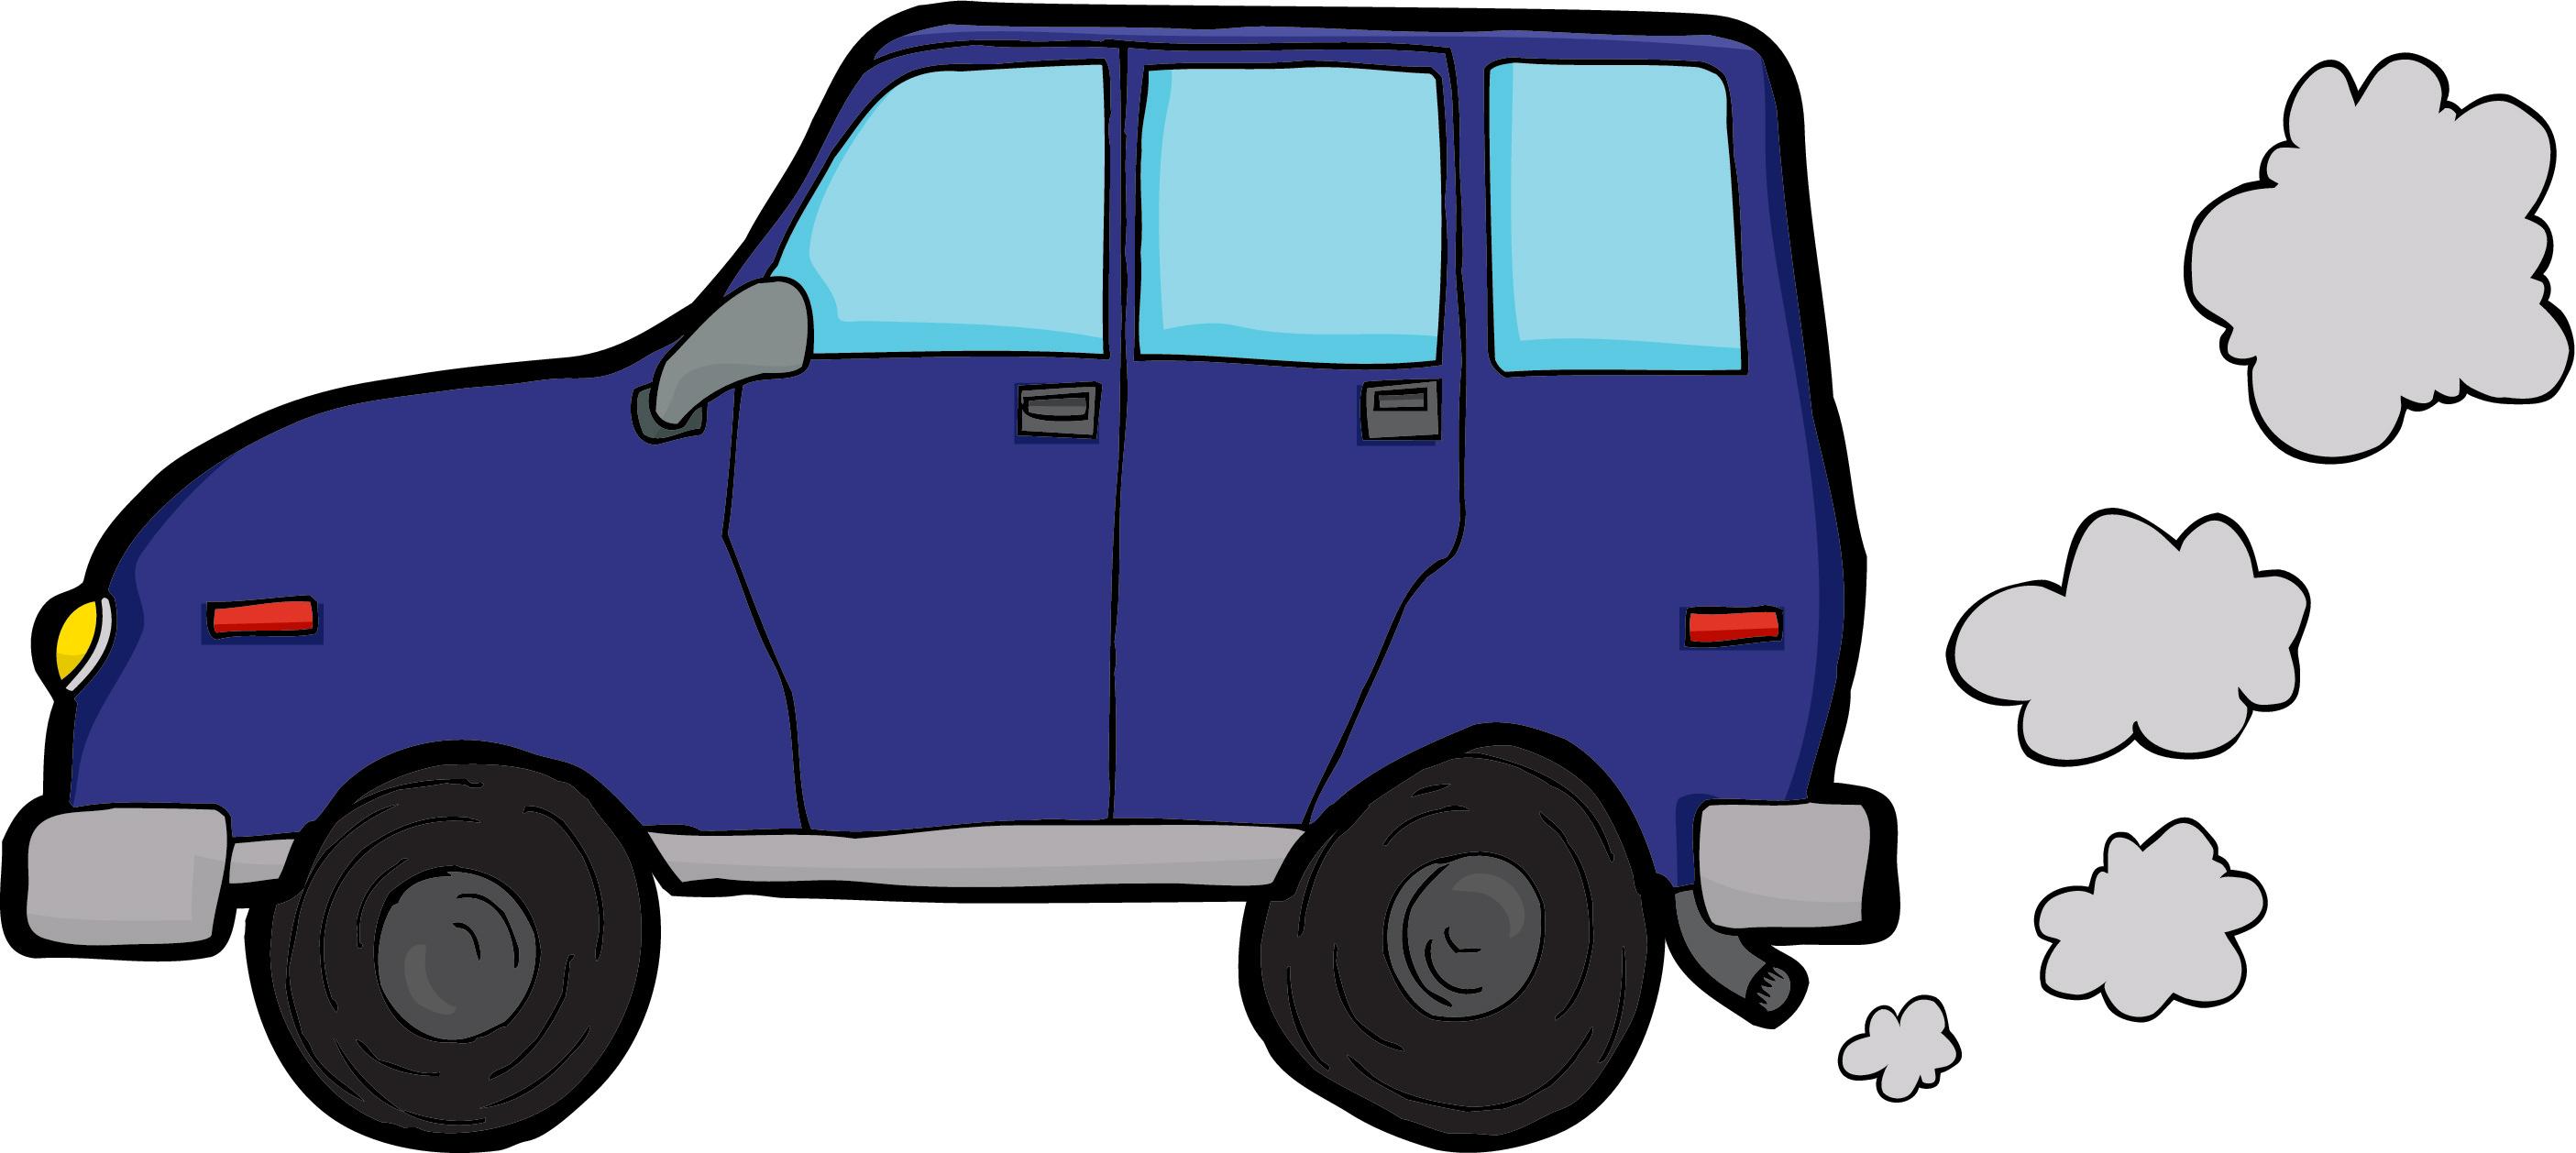 Car smoke car clipart clipart freeuse stock Smoke From Car Clipart - Clipart Kid clipart freeuse stock